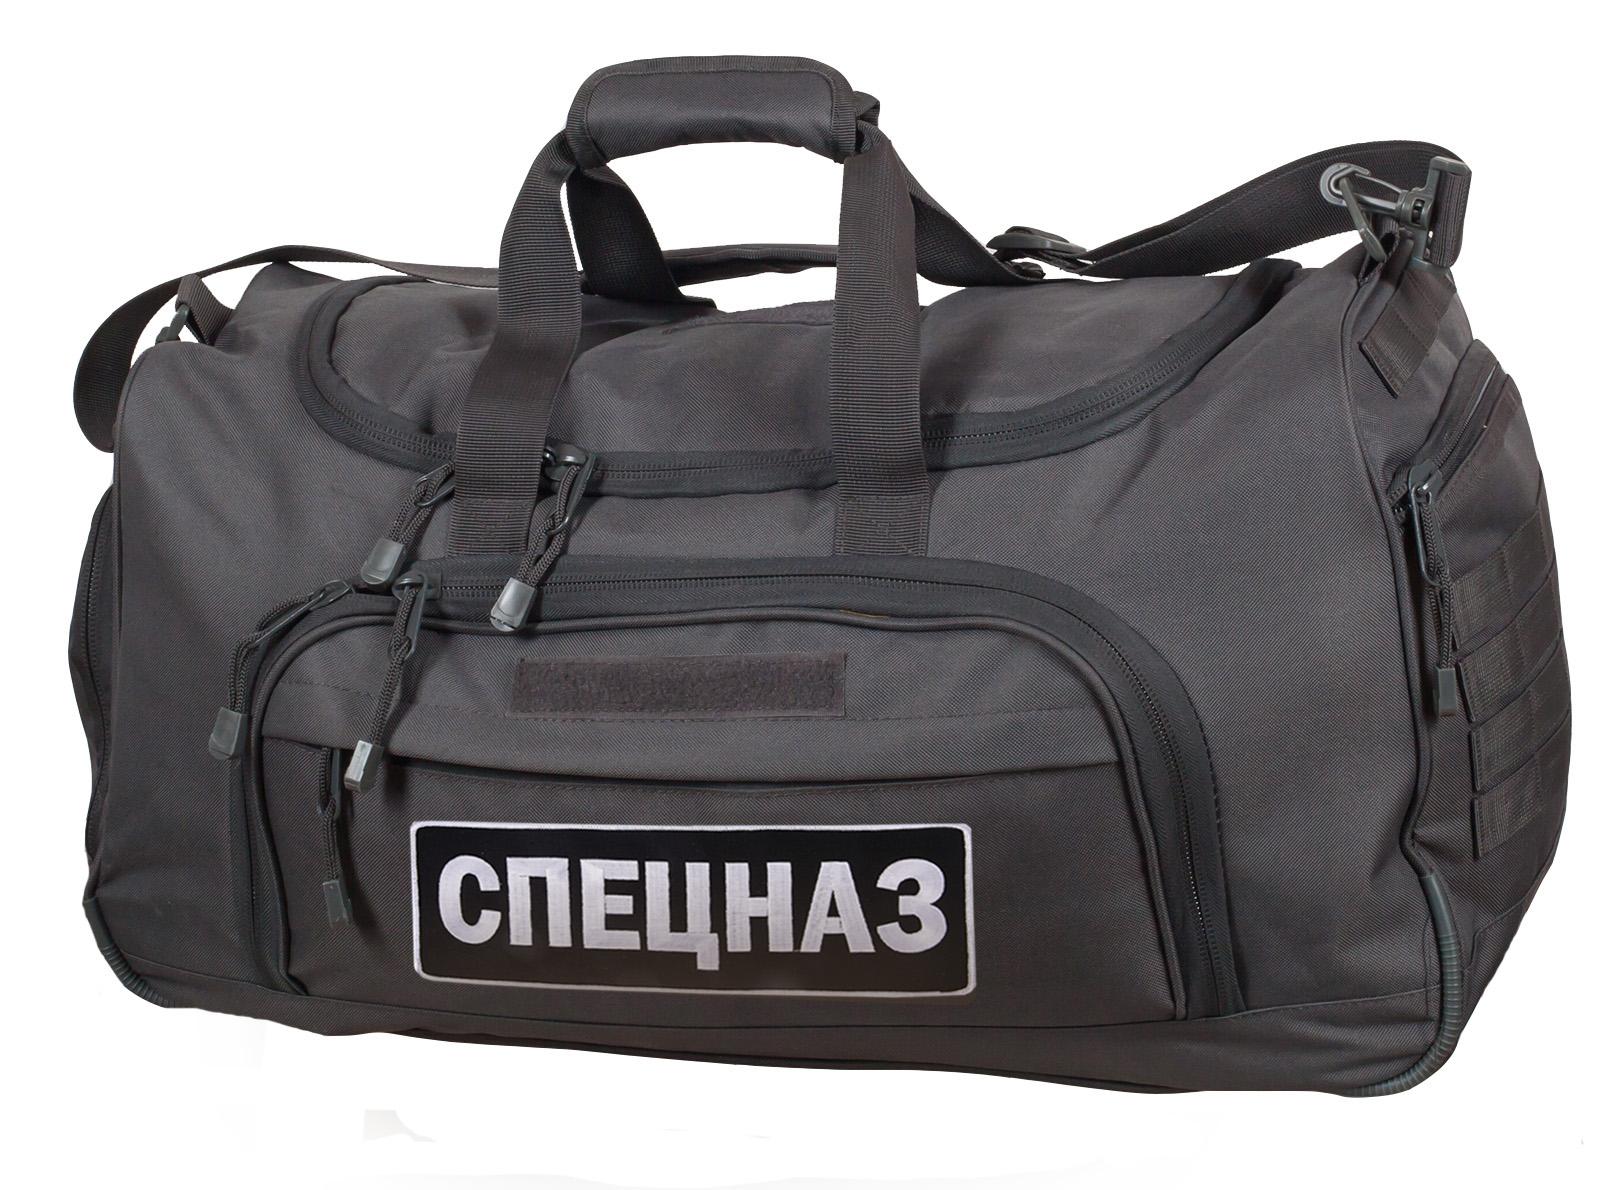 Респектабельная спецназовская сумка